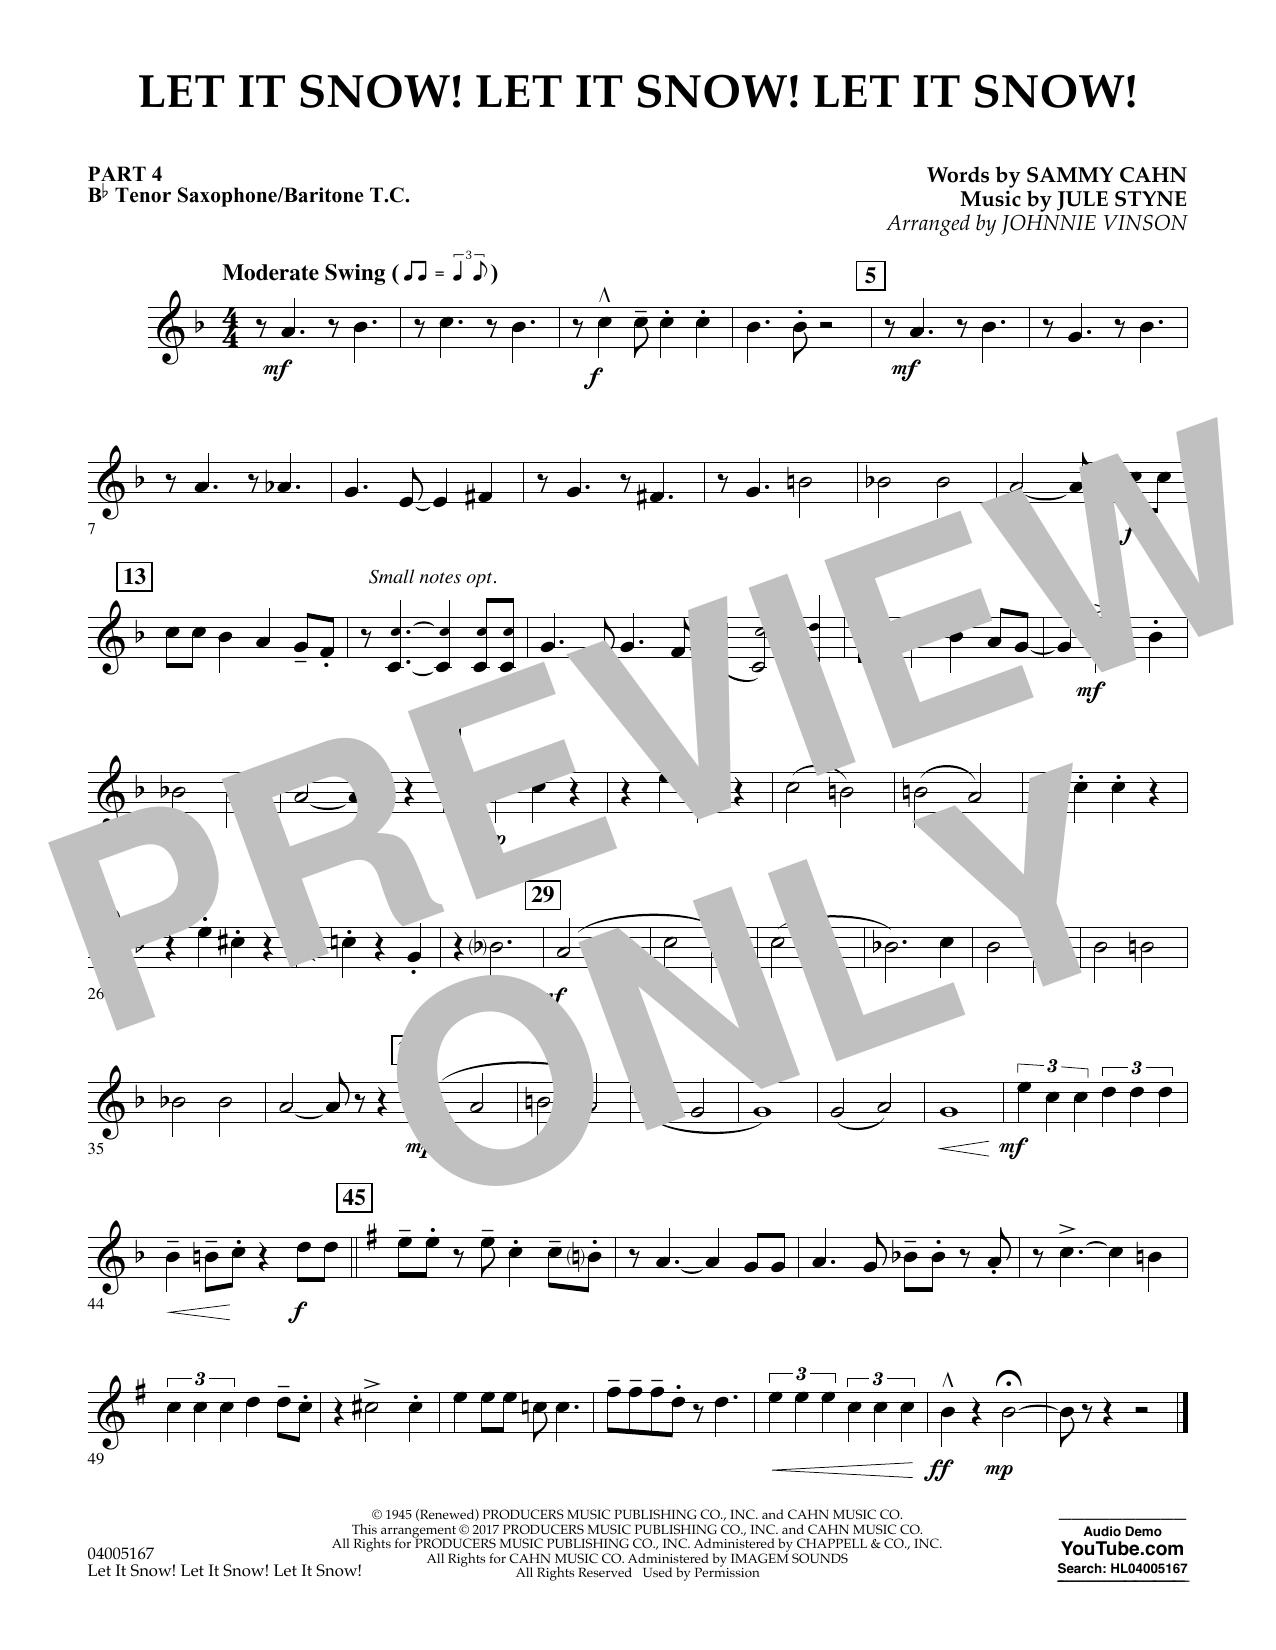 Let It Snow! Let It Snow! Let It Snow! - Pt.4 - Bb Tenor Sax/Bar. T.C. (Concert Band)